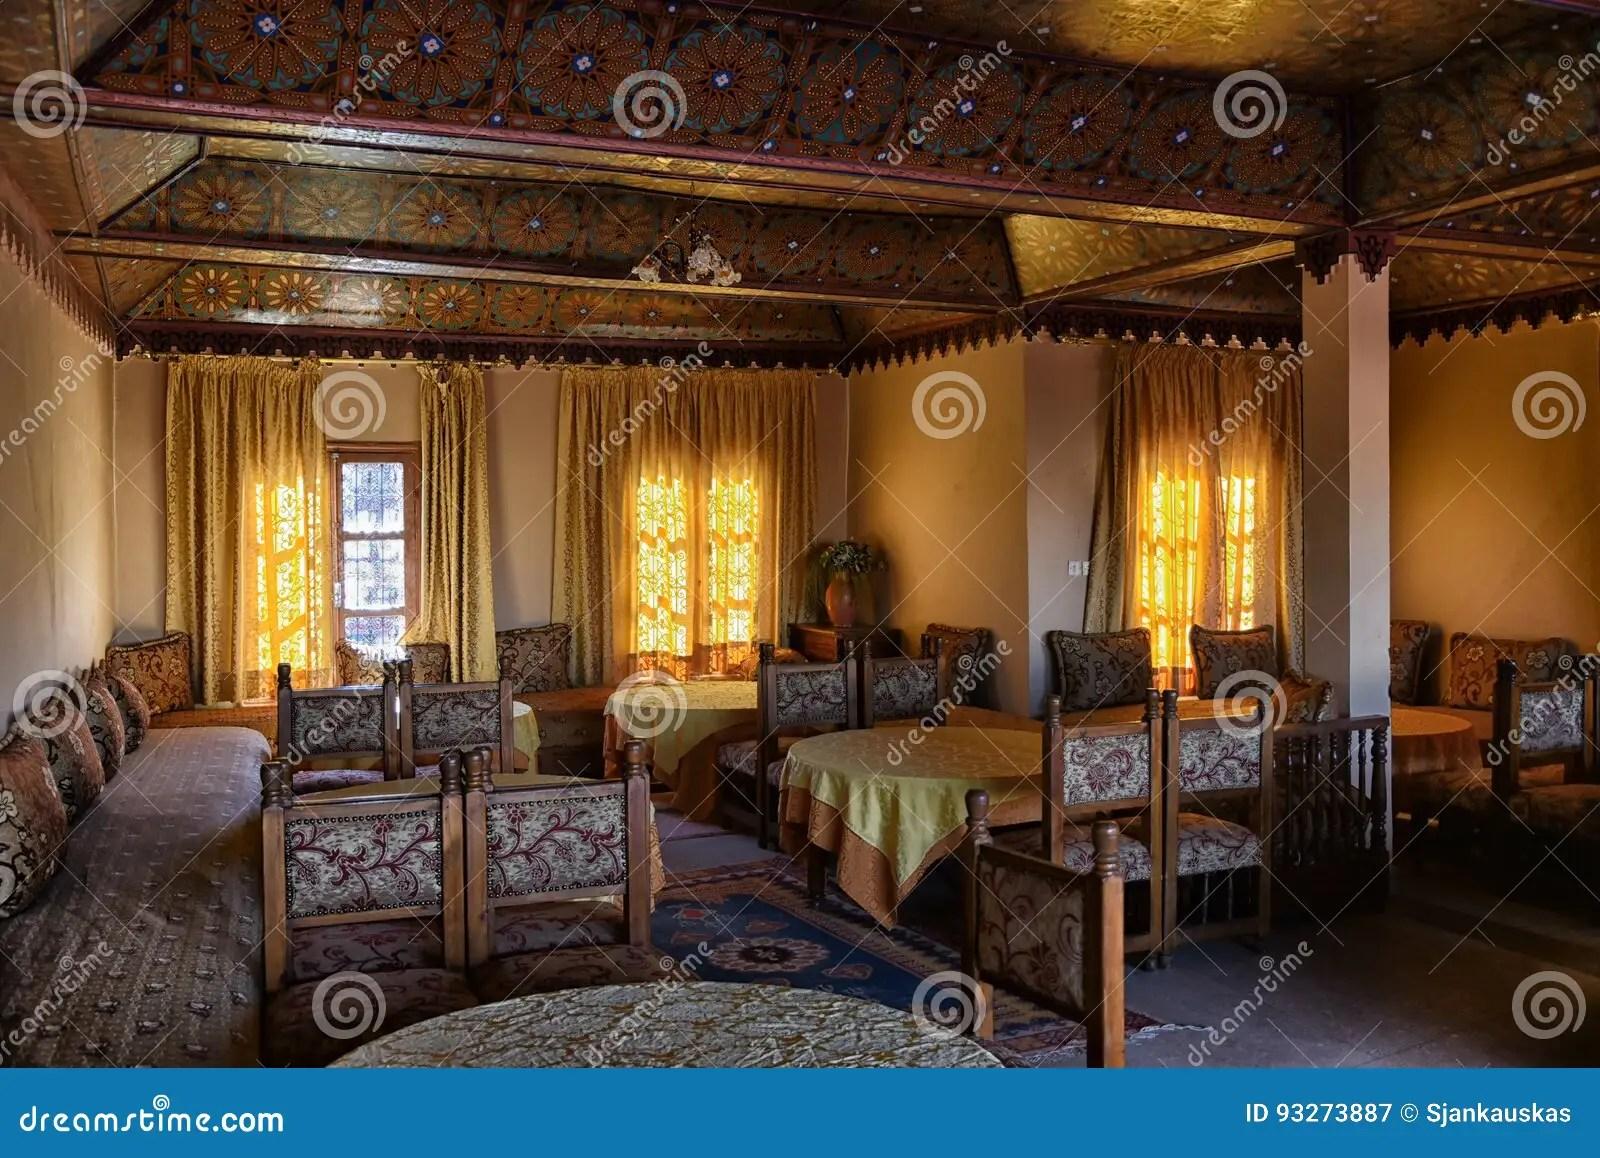 Arabic restaurant Morocco stock image Image of cuisine